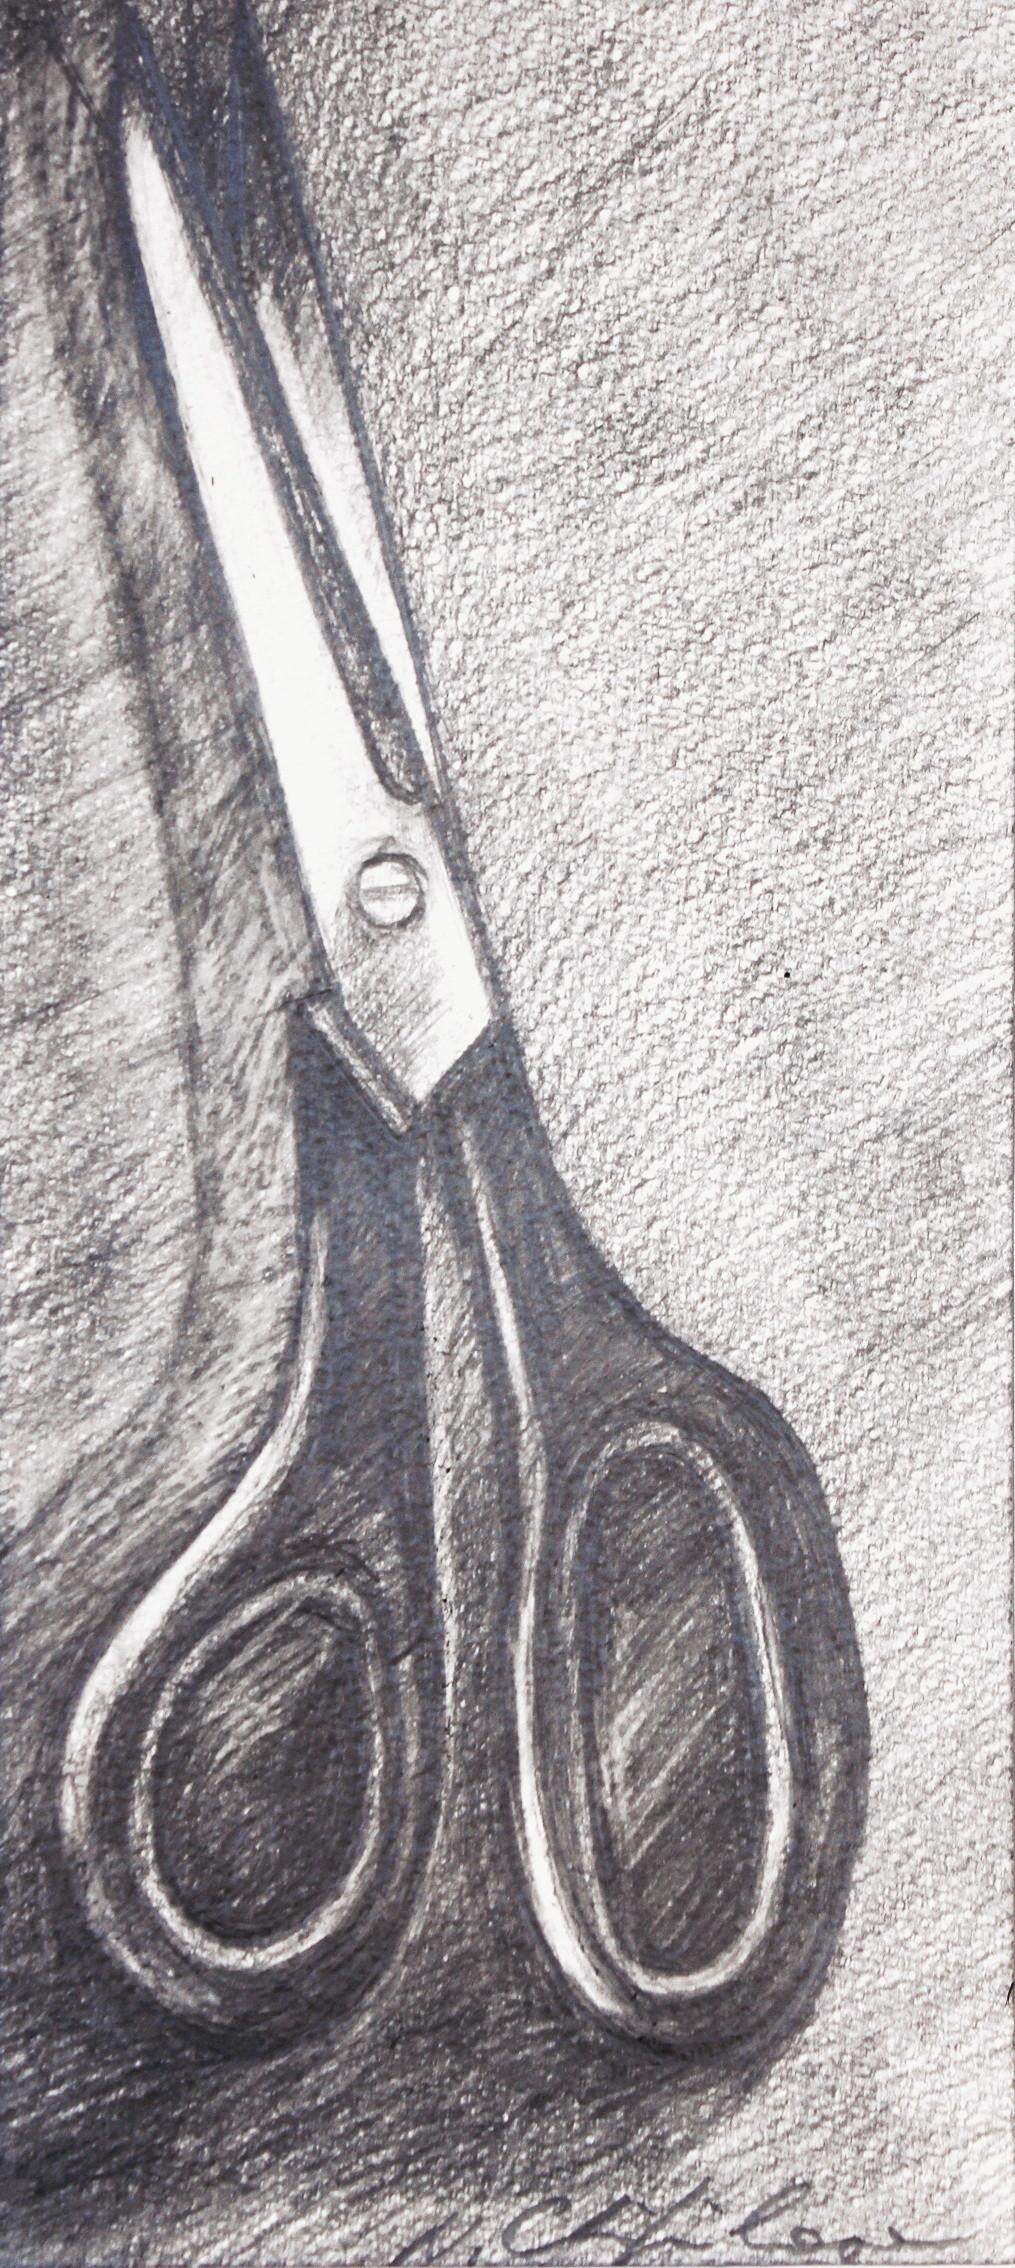 Nath Chipilova (Atelier NN art store) - Scissors 1, 32x16cm